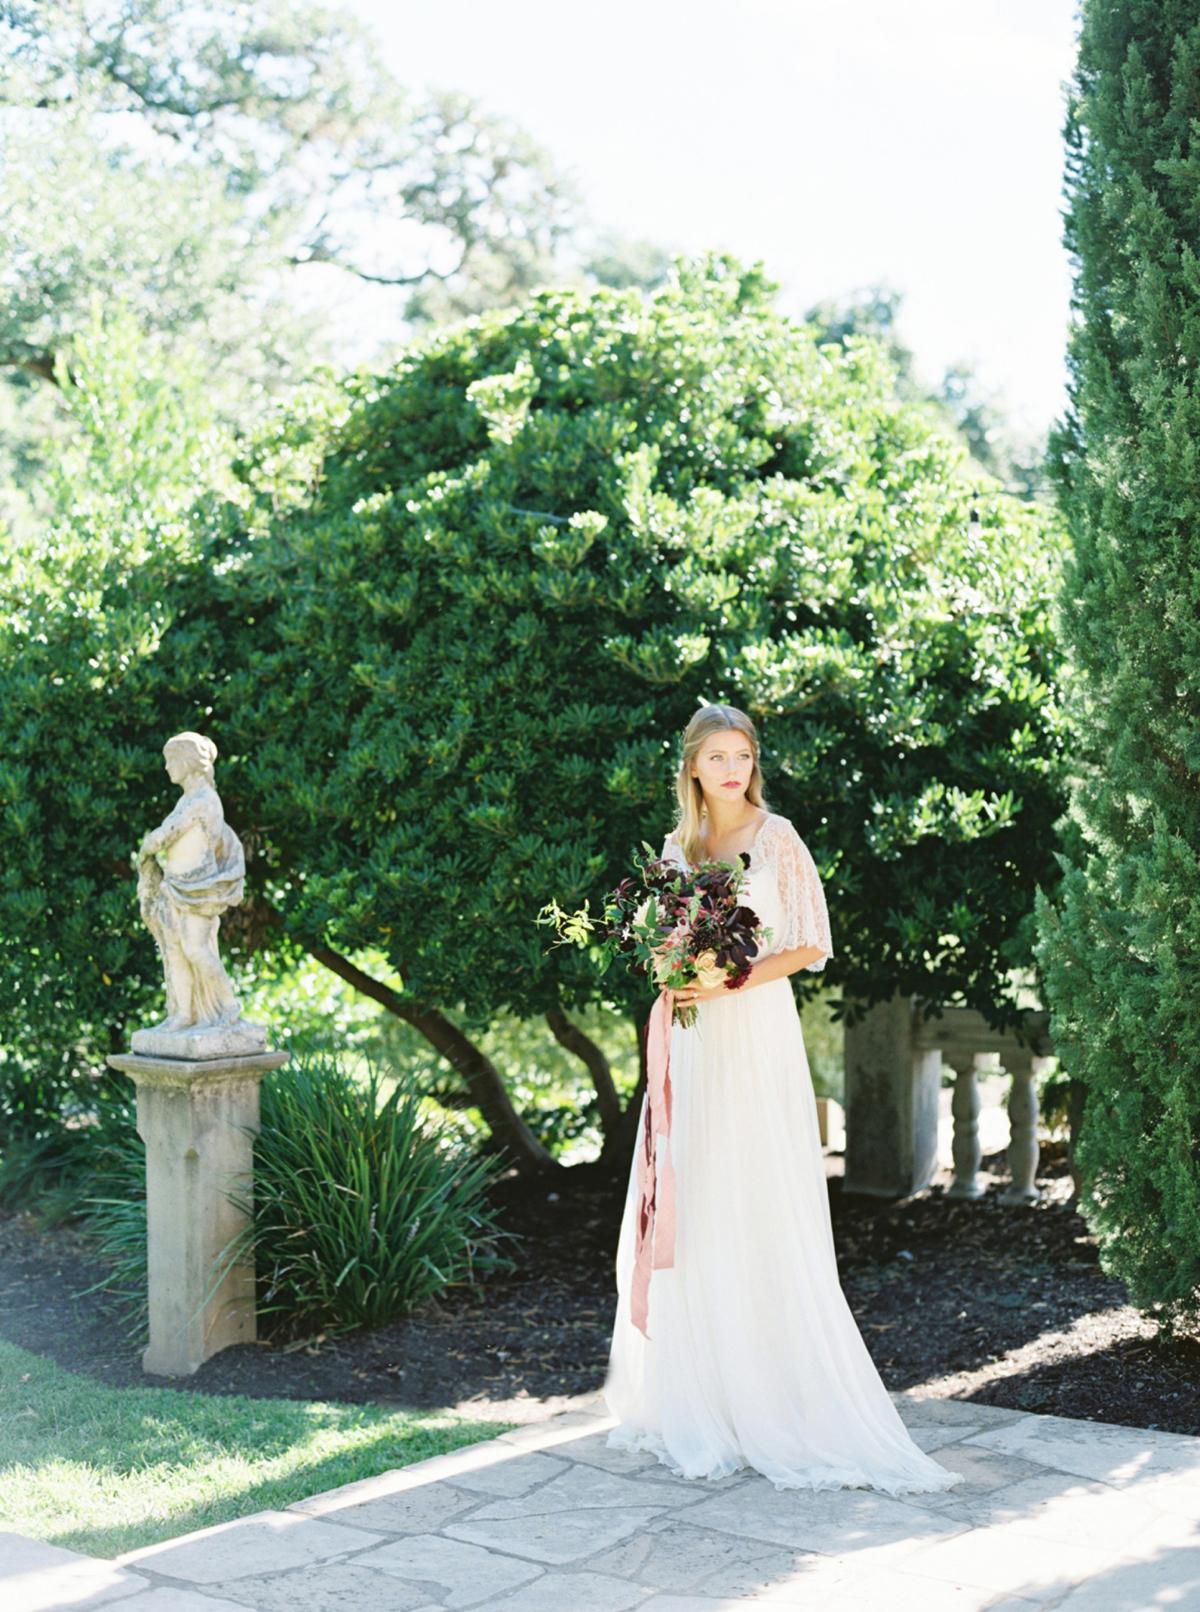 Early Fall Bride